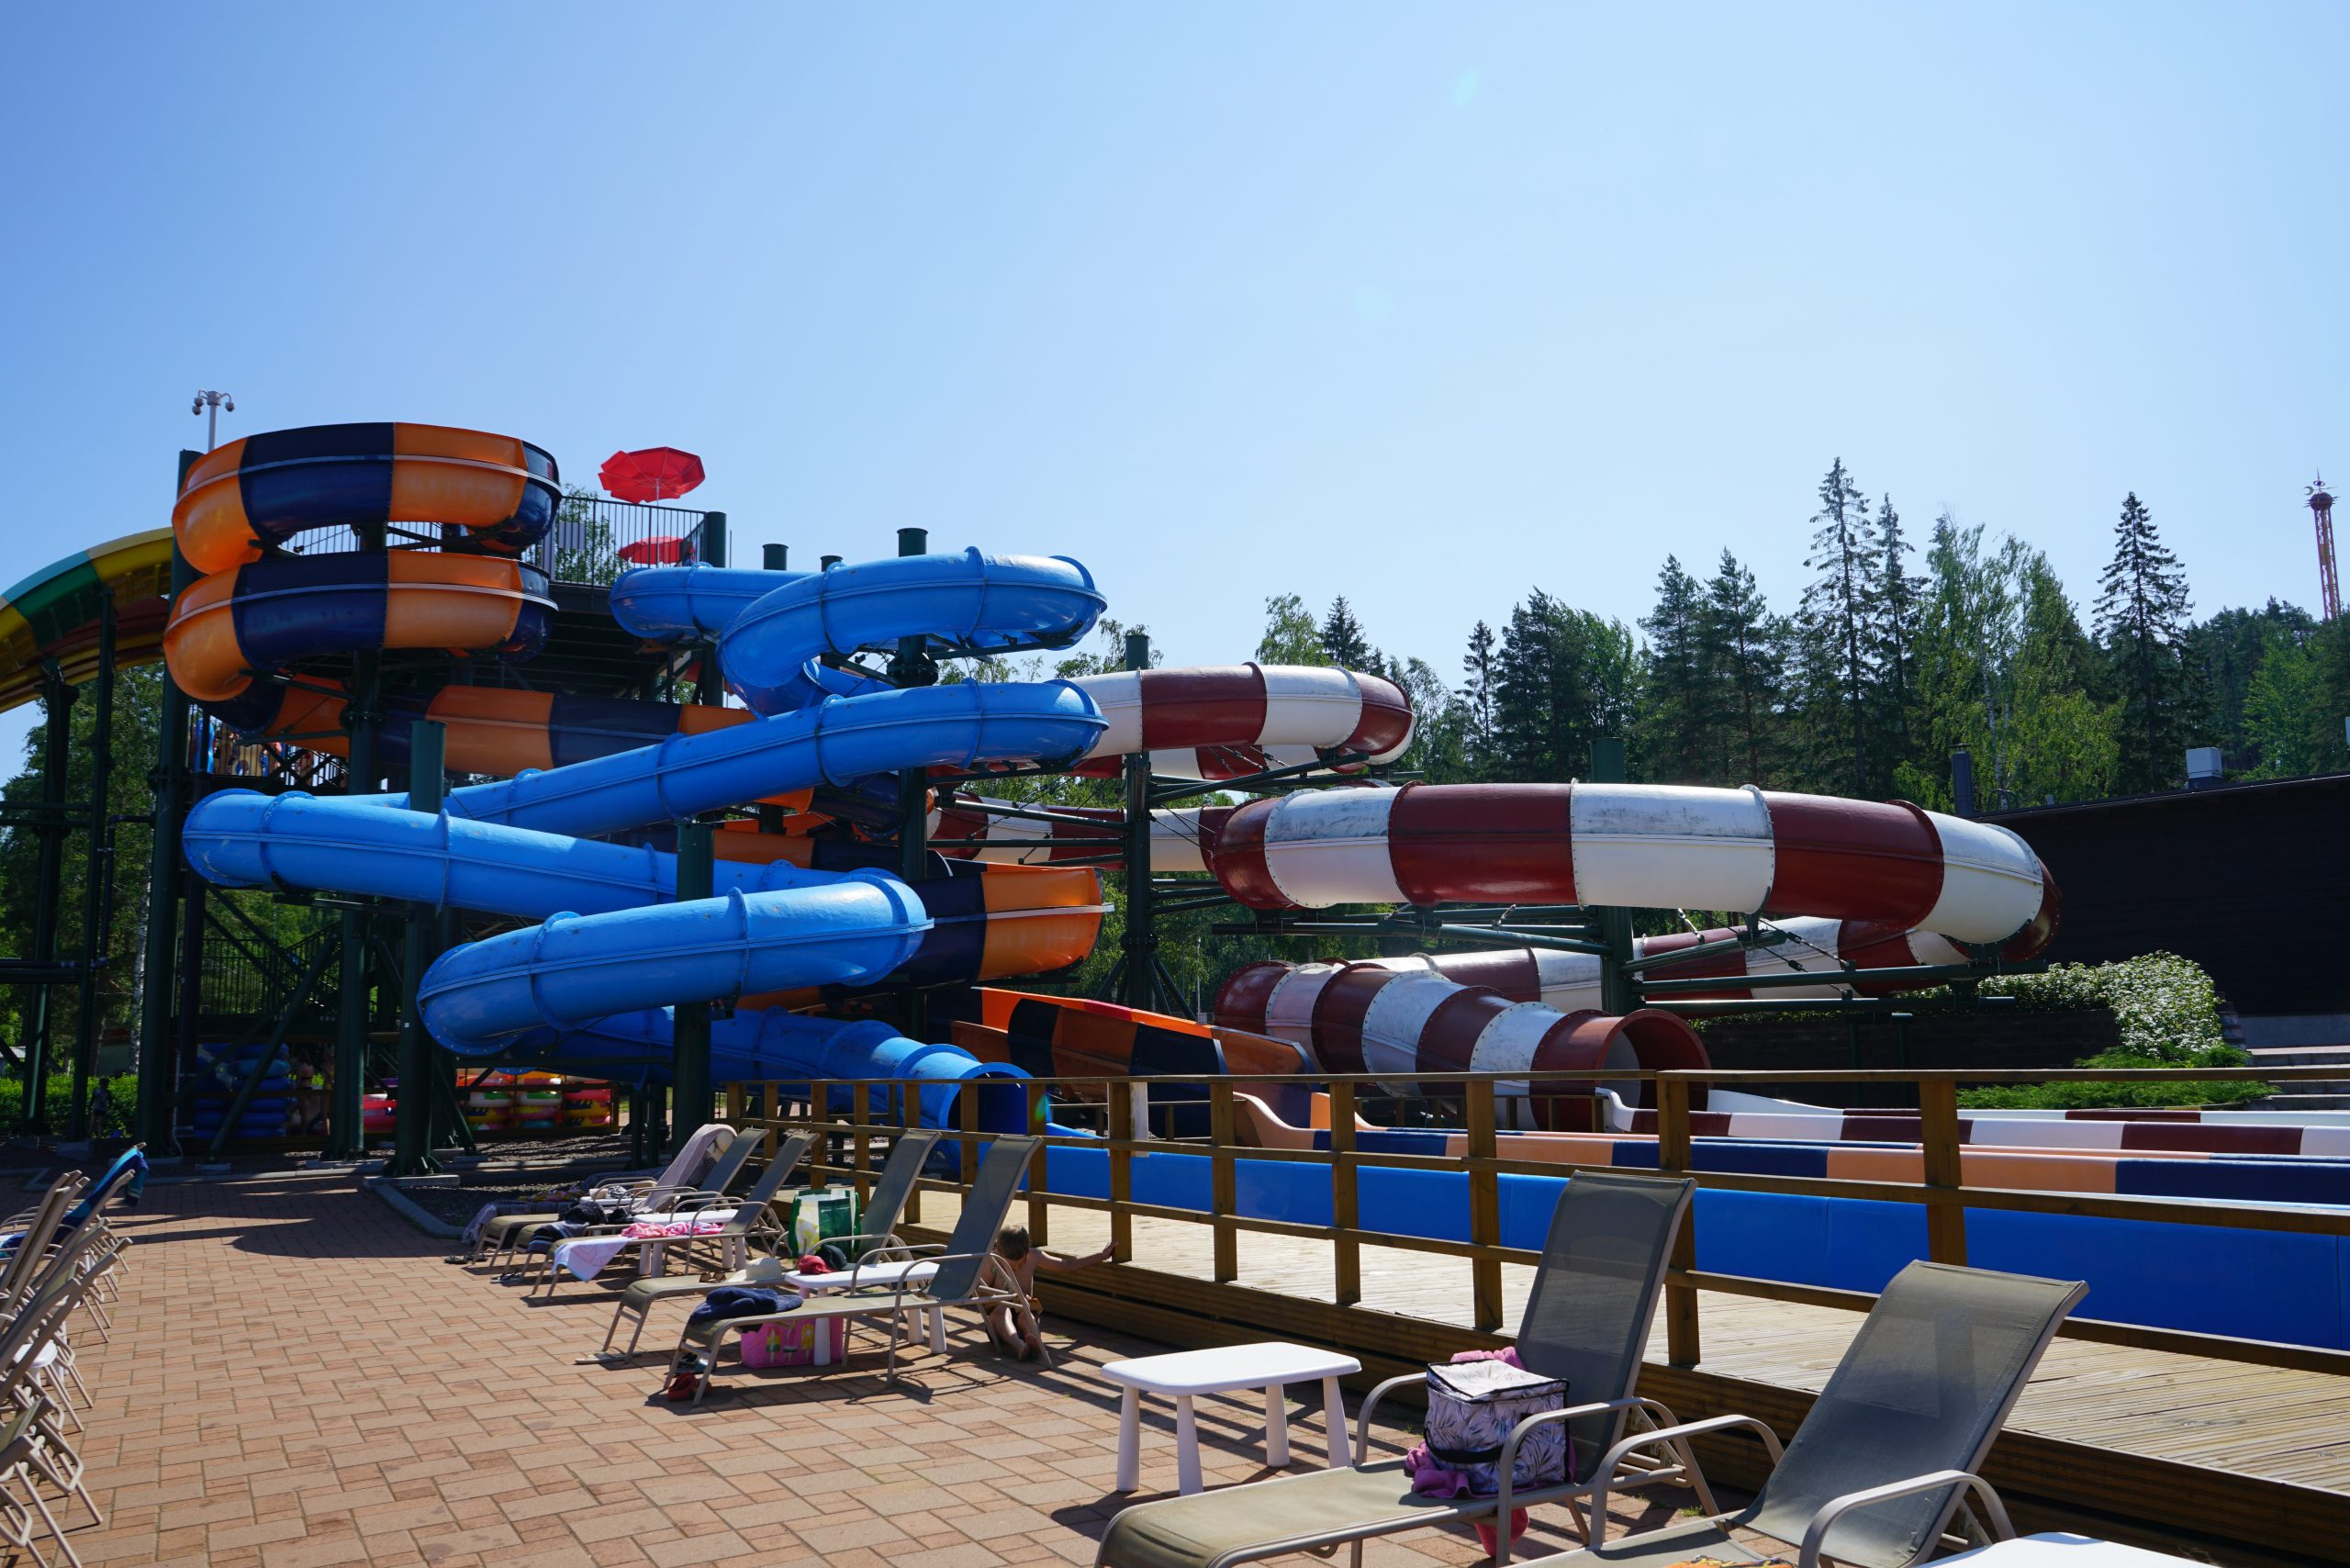 Tykkimäki Aquapark_liukumäet